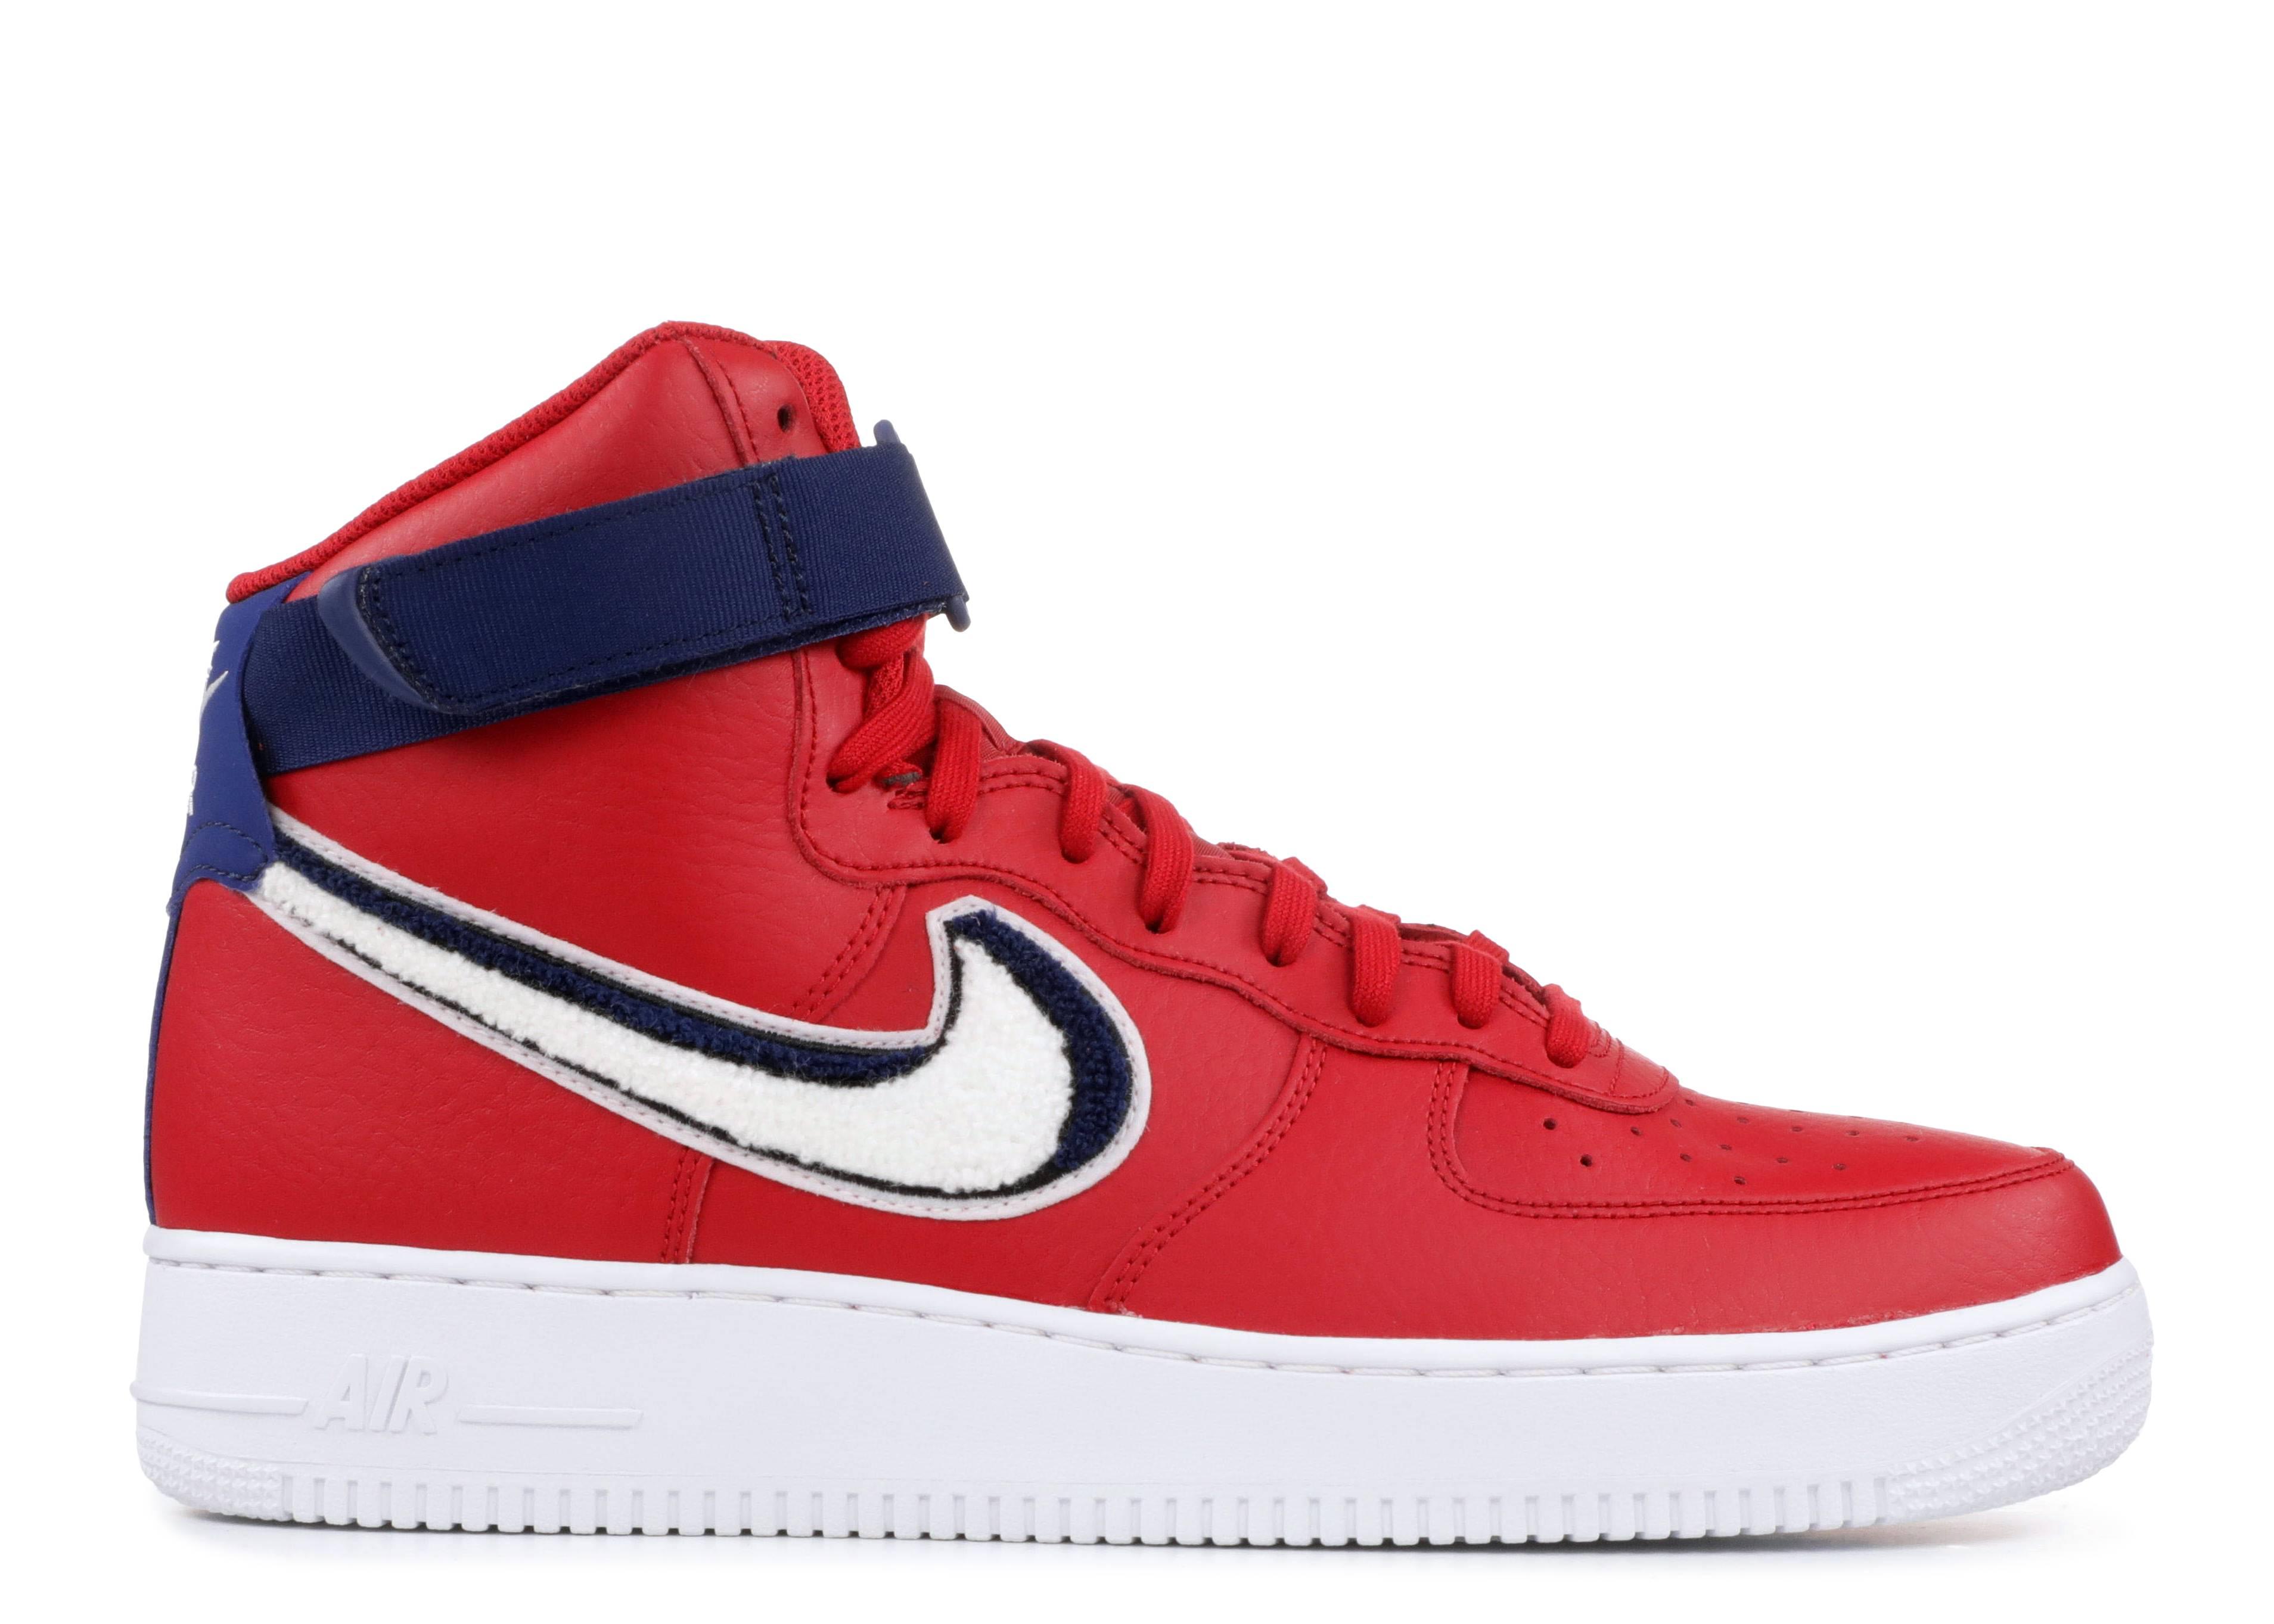 check out 3b08b 57ab5 Air Force 1 High  07 Lv8 - Nike - 806403 603 - gym red white-blue void-white    Flight Club